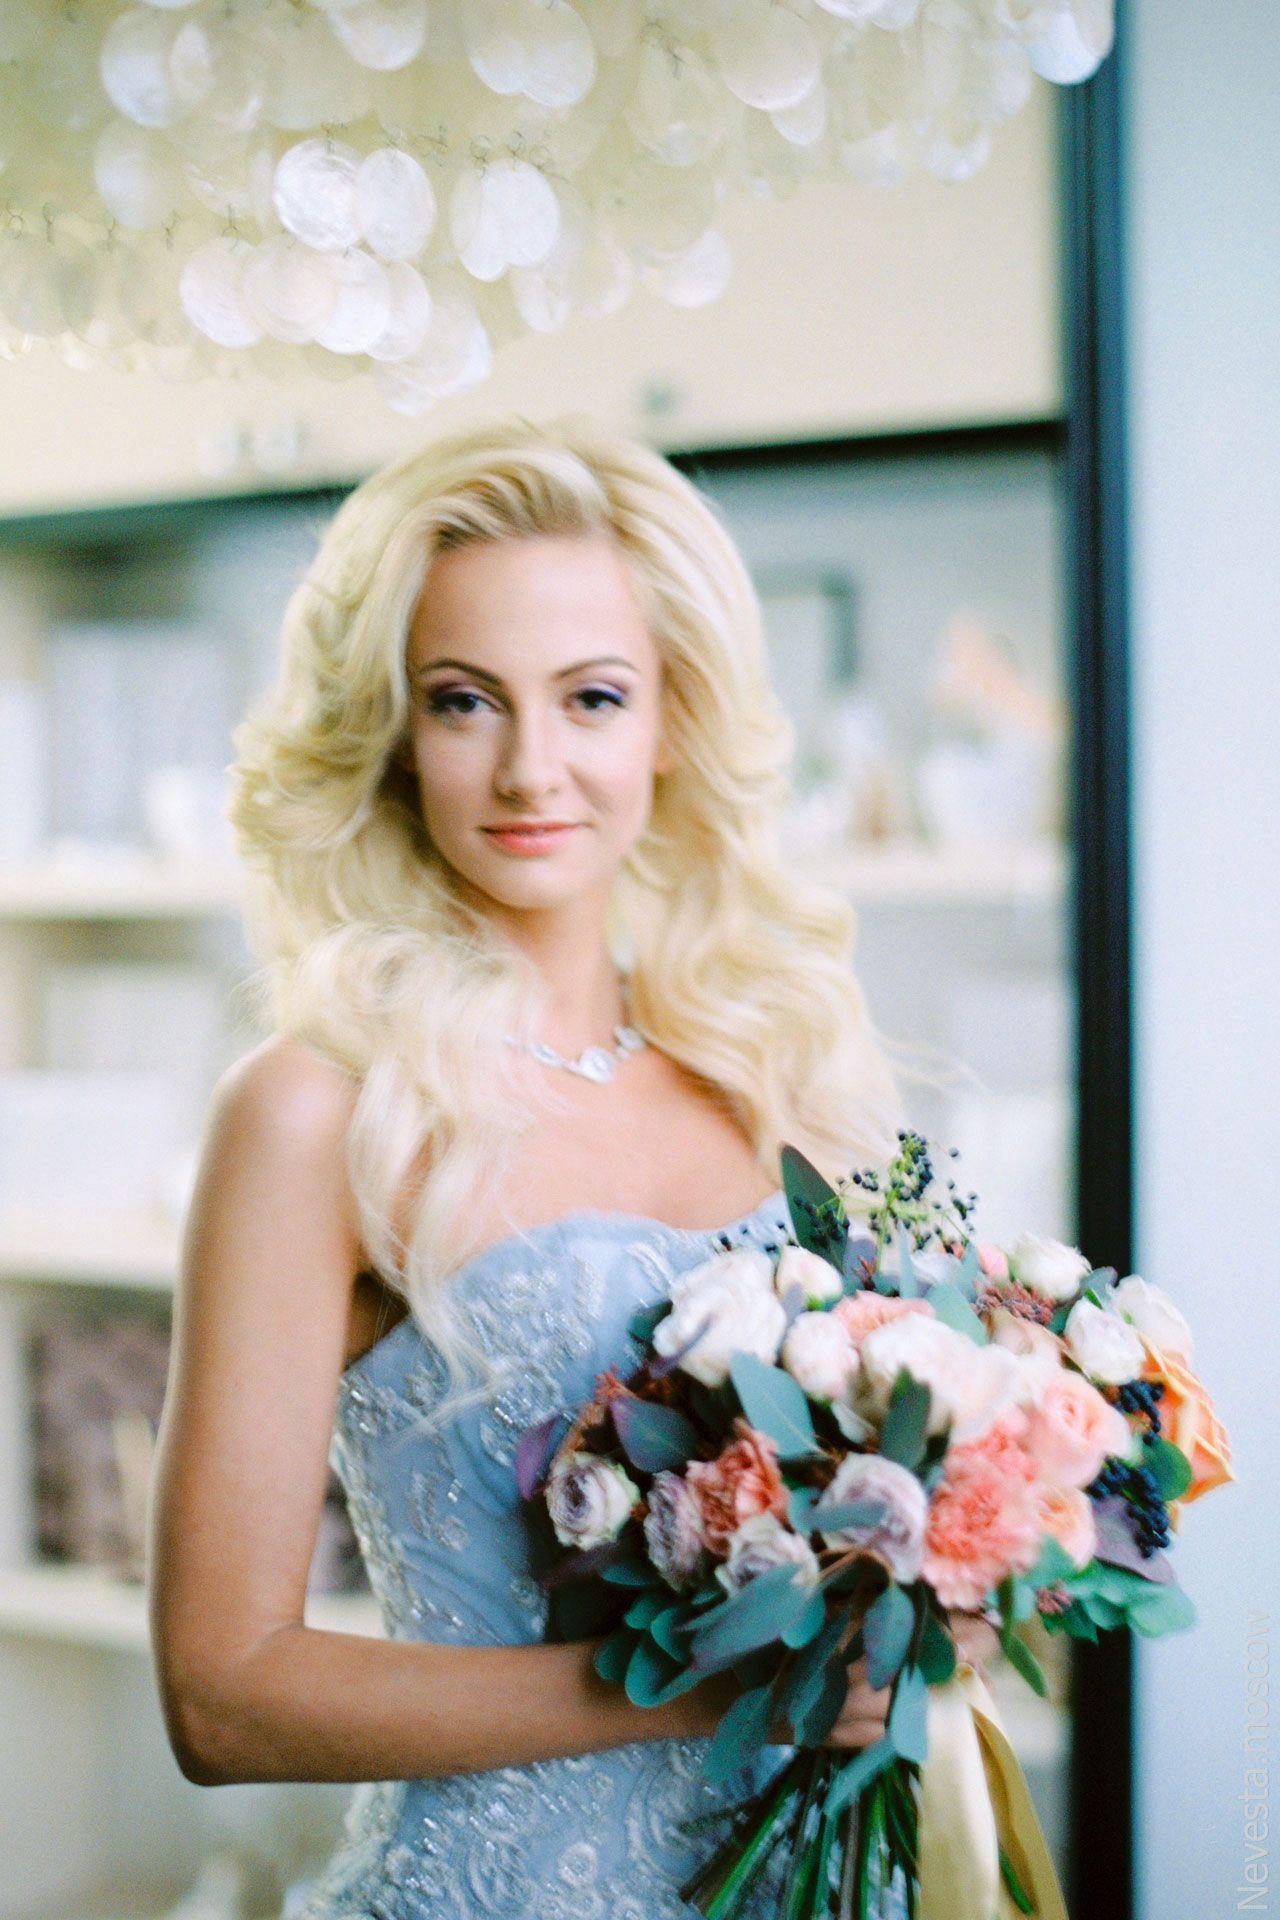 актриса Полина Максимова в свадебном платье невеста фото 4